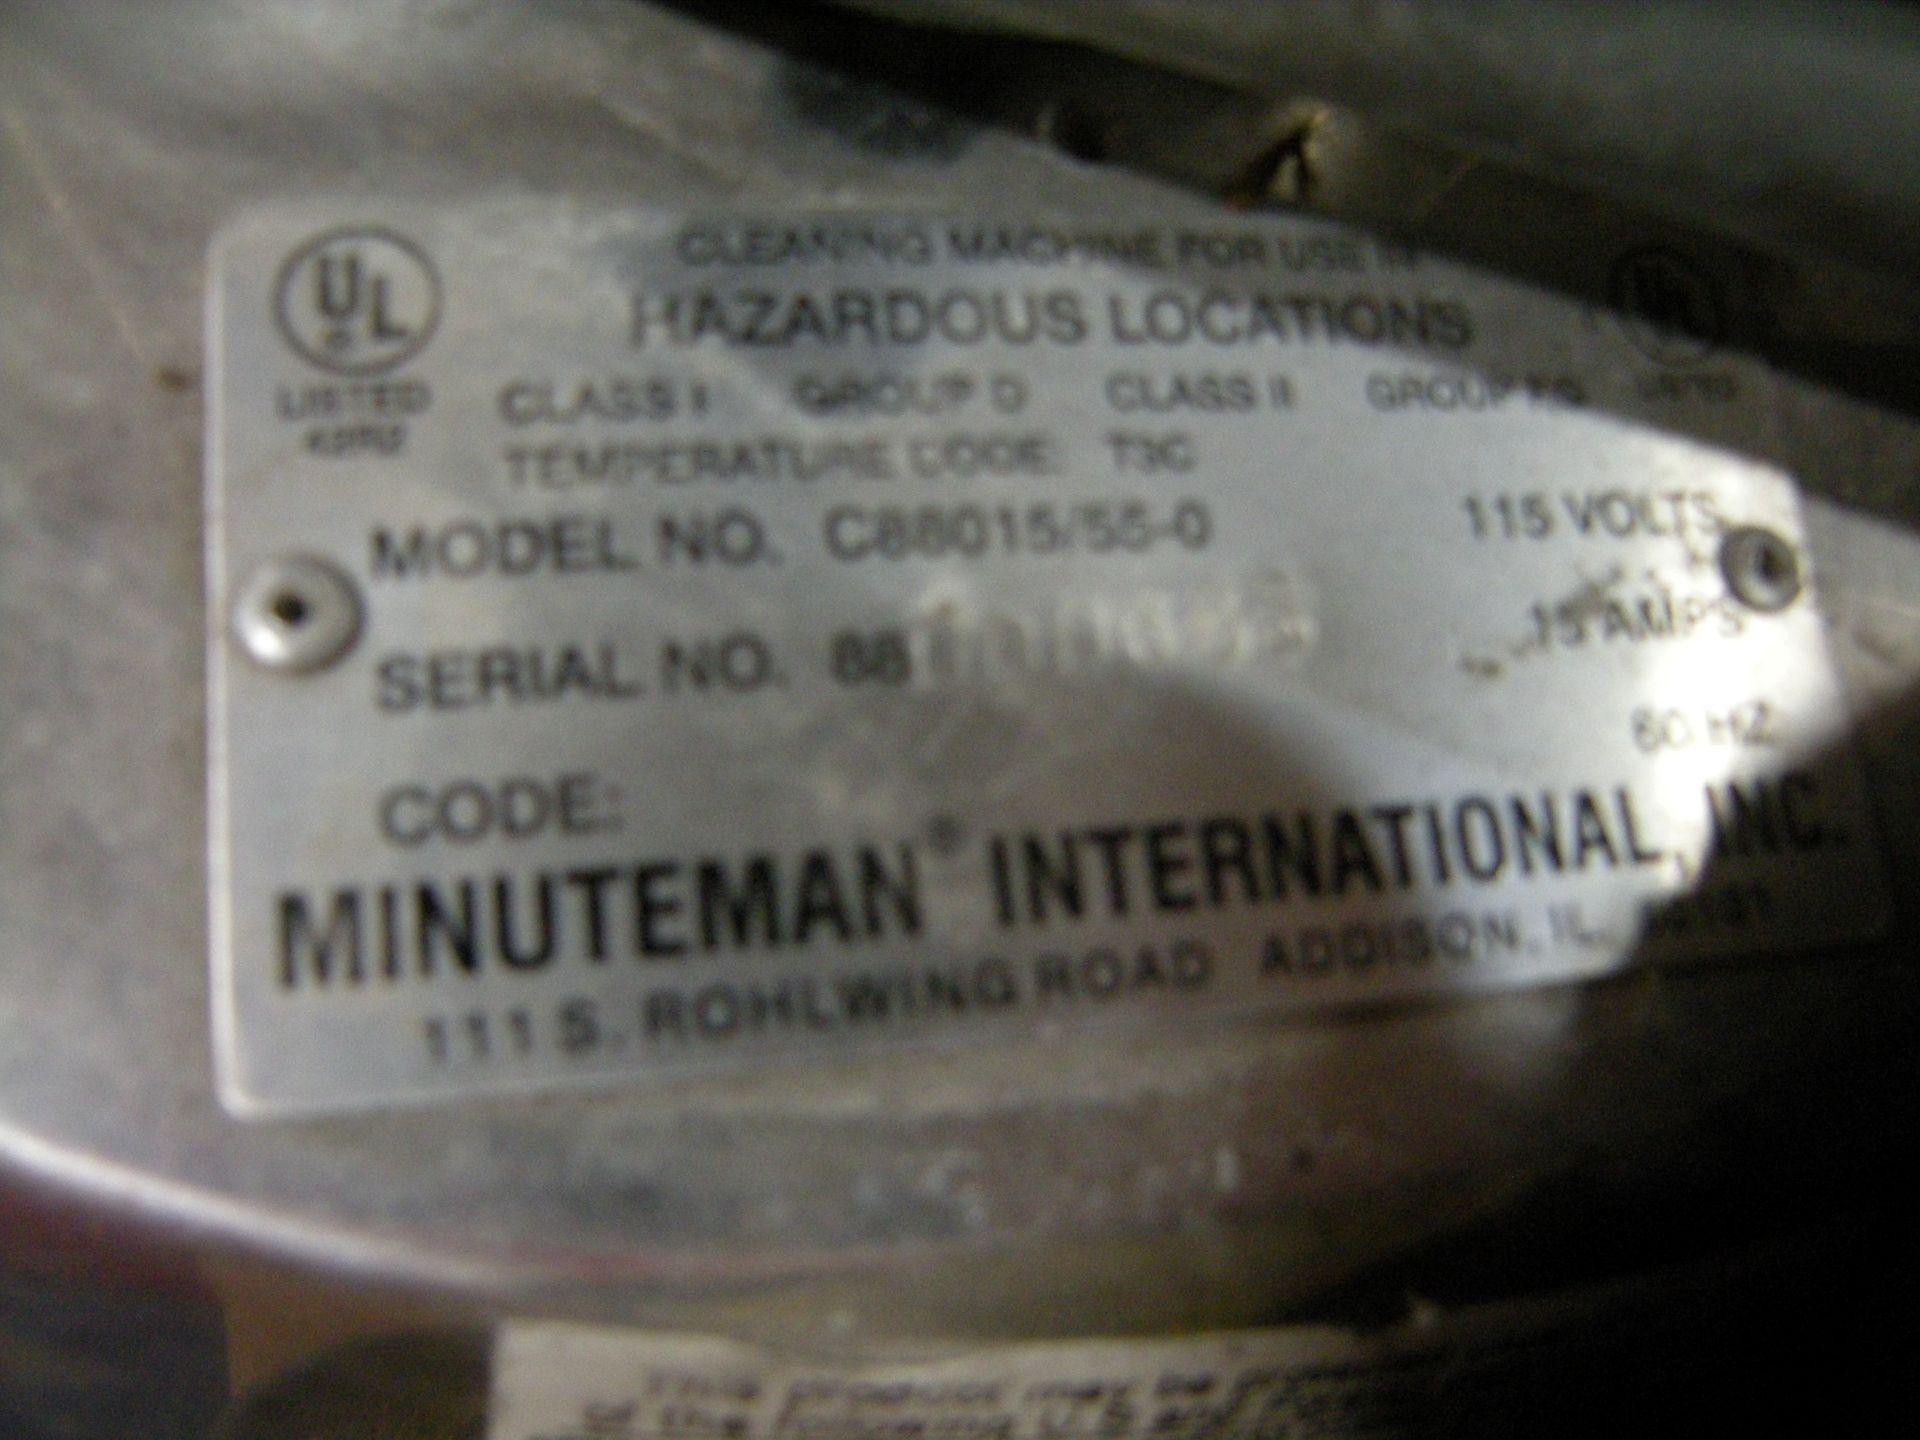 Lot 350 - Minuteman International Industrial Vaccum IS 14560 SKU: 1232